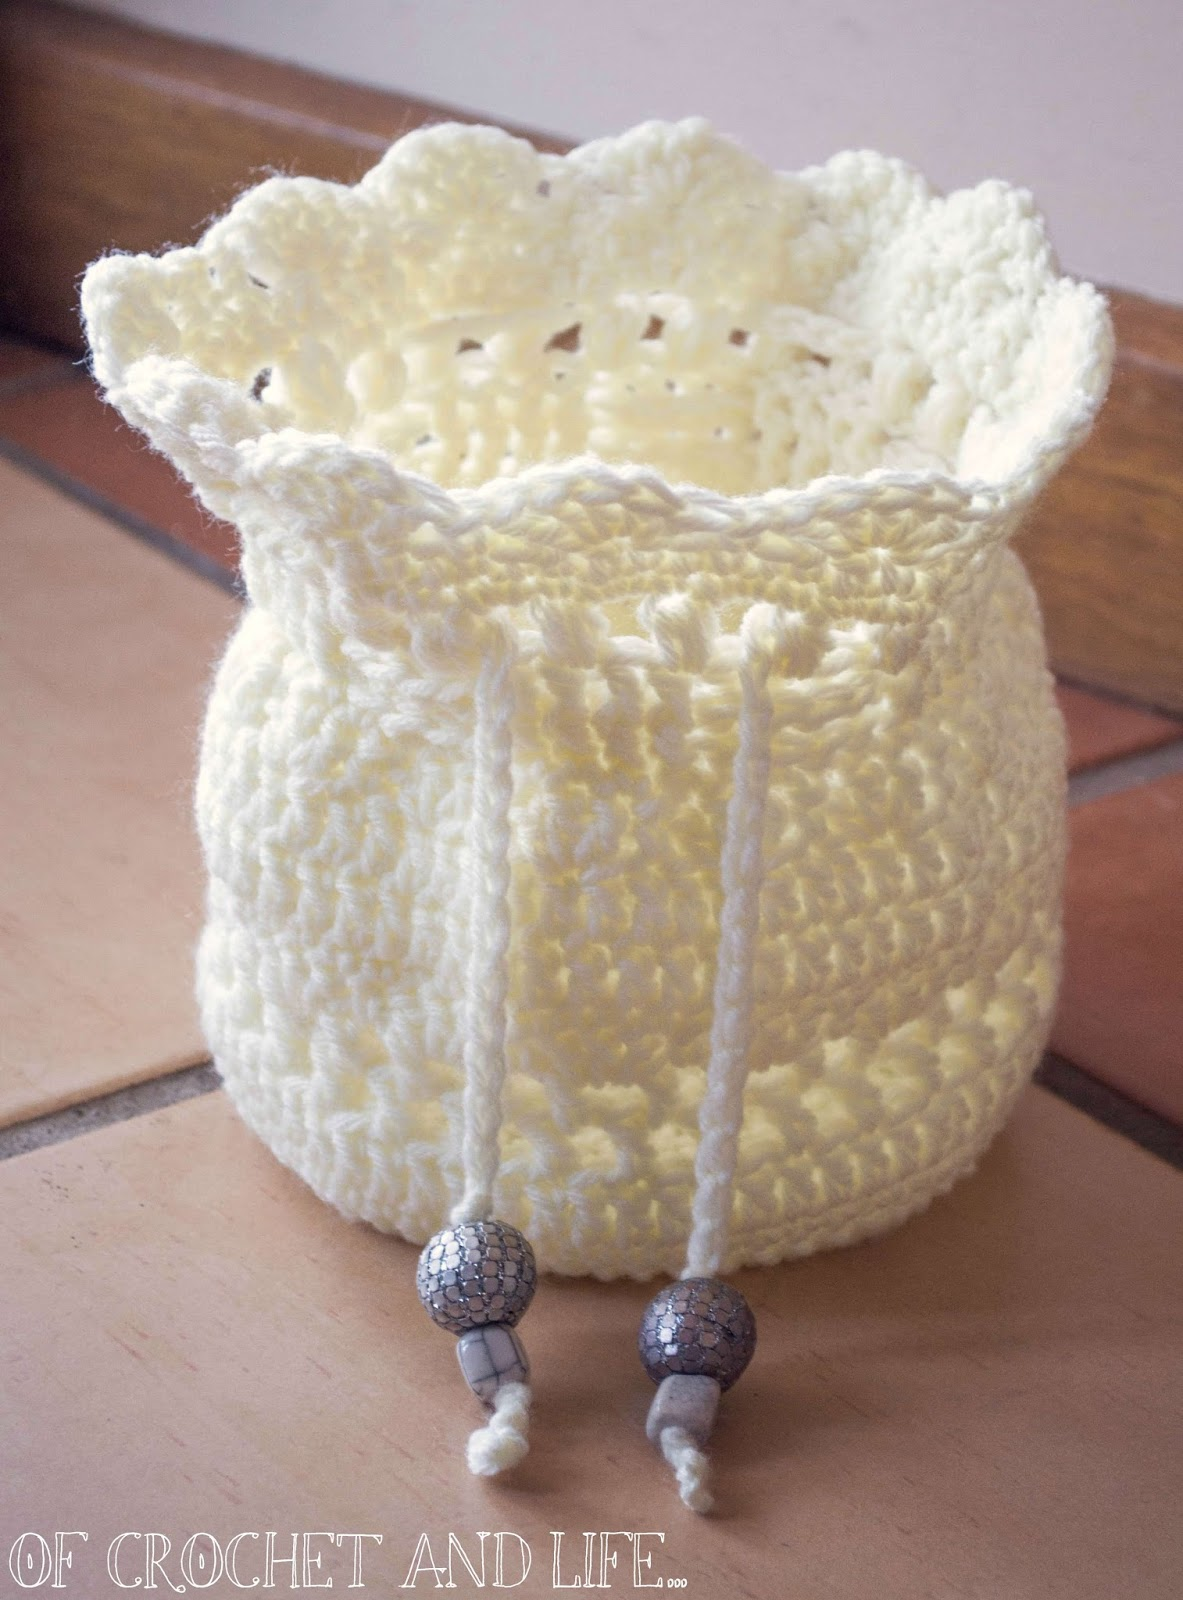 Of crochet and life tashas tarot bag crochet pattern tashas tarot bag crochet pattern bankloansurffo Images